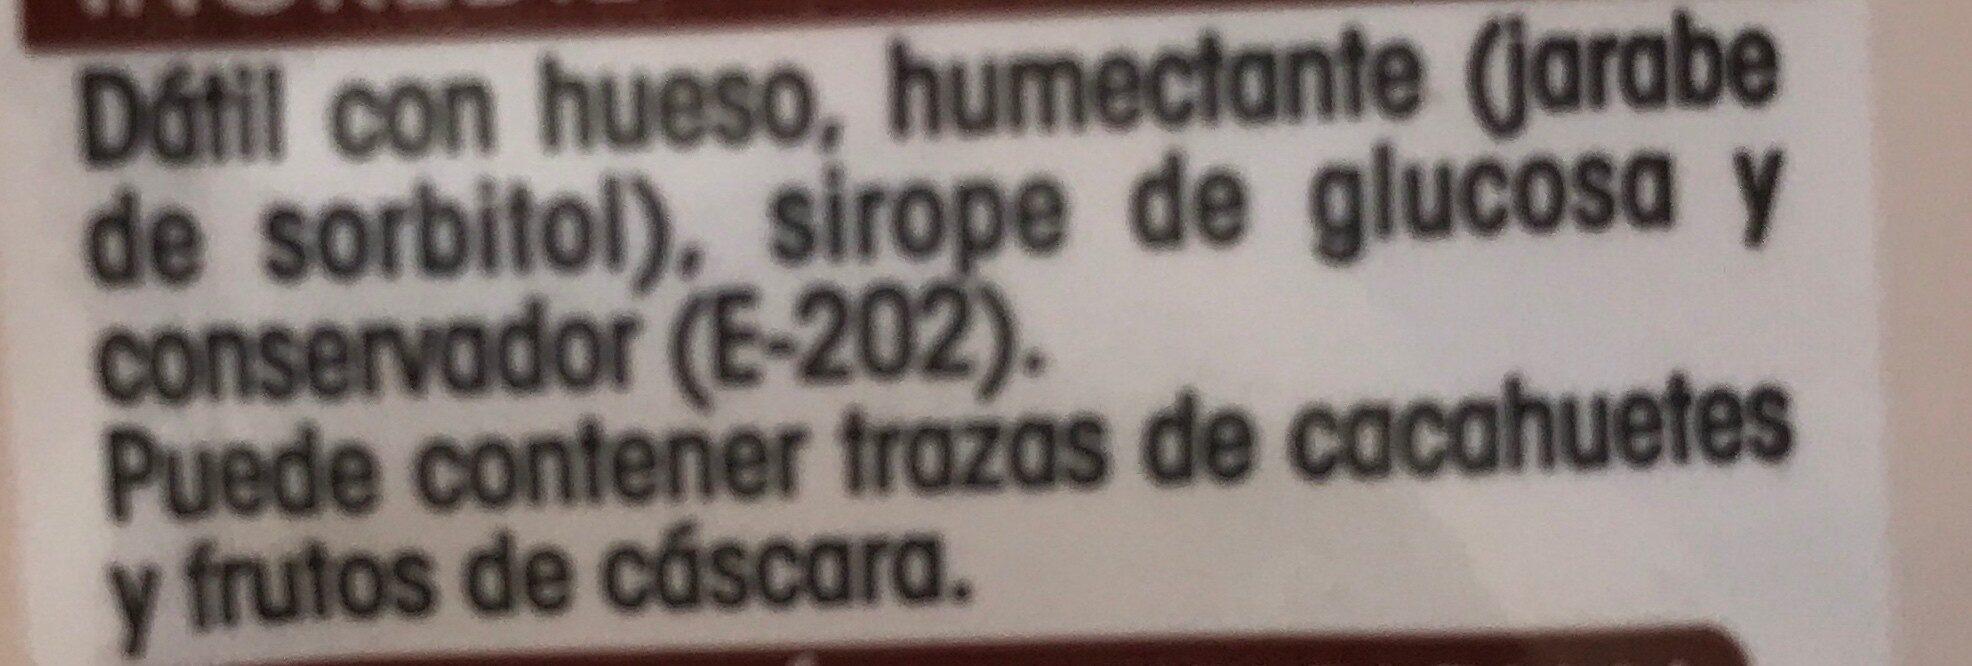 Dattes - Ingredientes - es